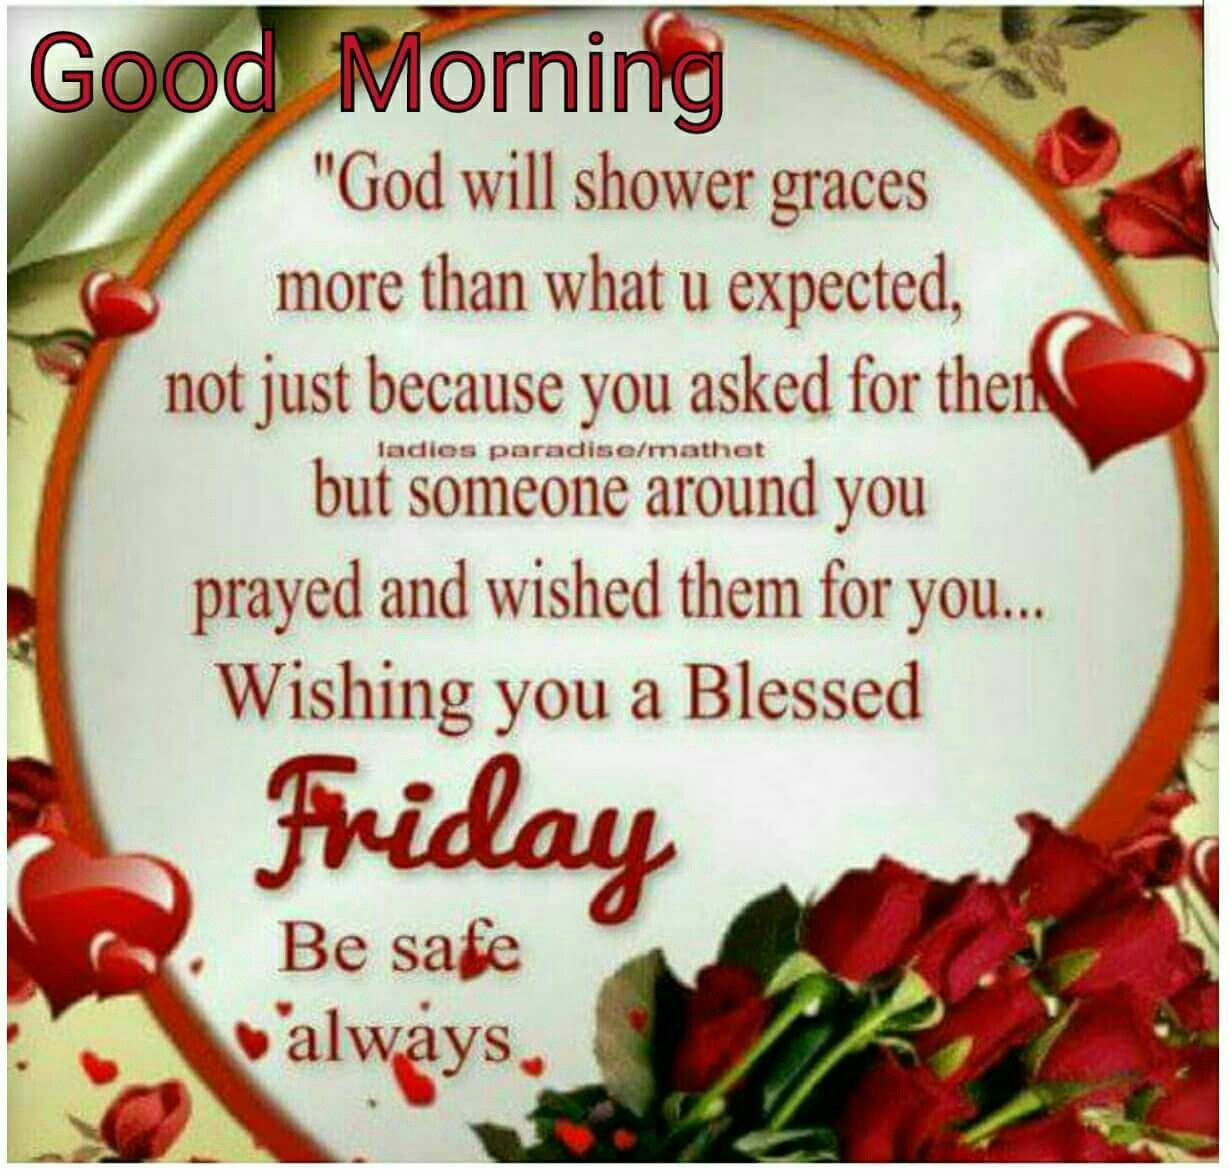 Good Morning Friday Blessings | Good morning friday, Happy ...